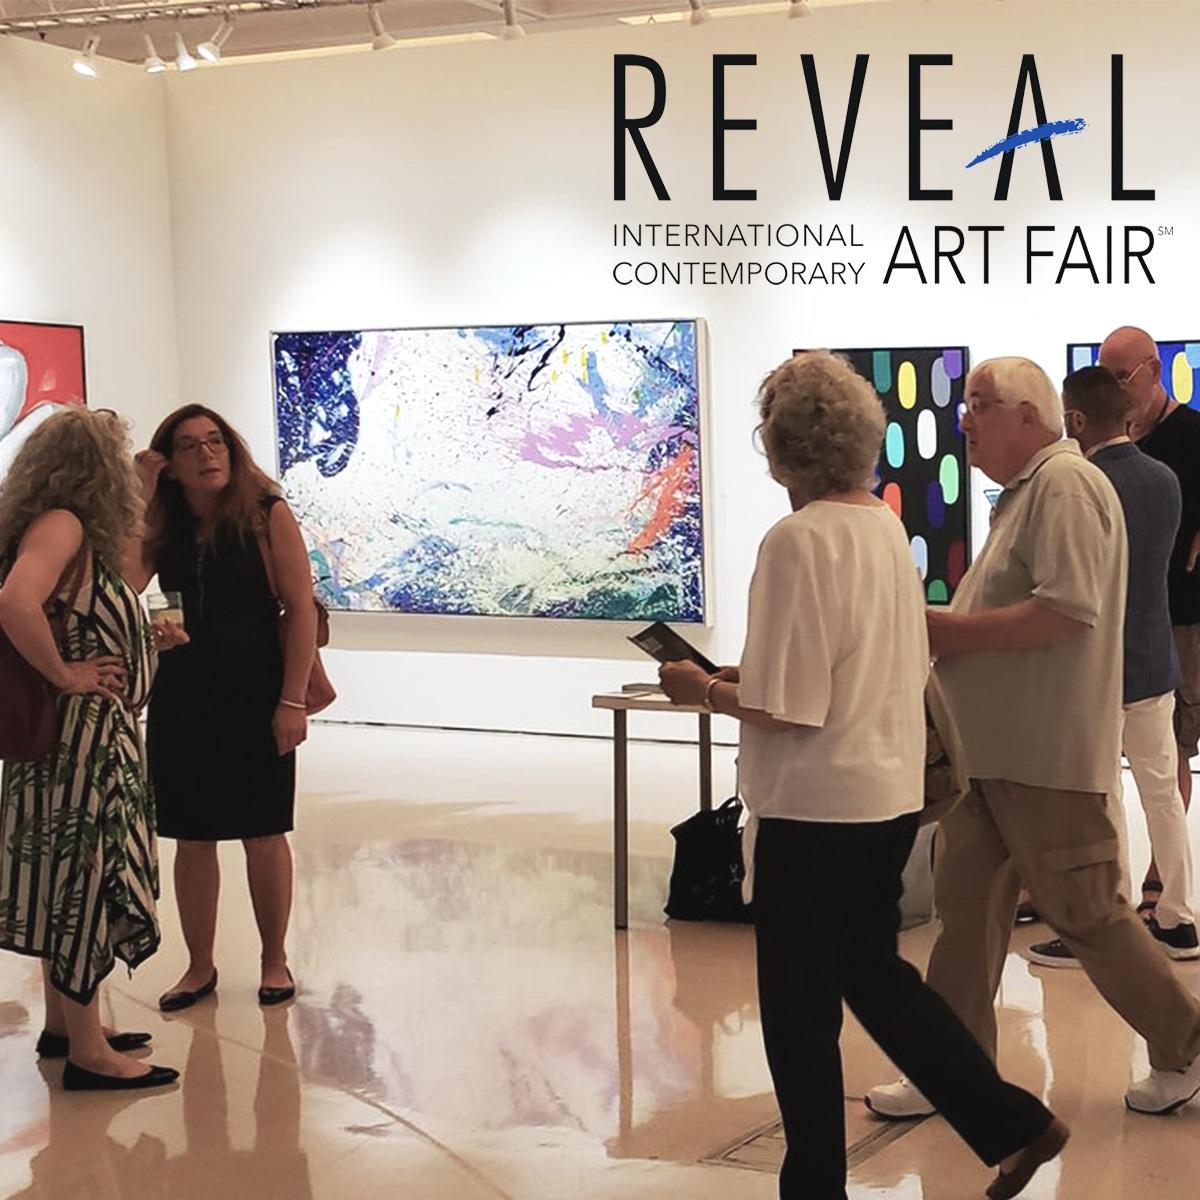 REVEAL Art Fair - July 18-21